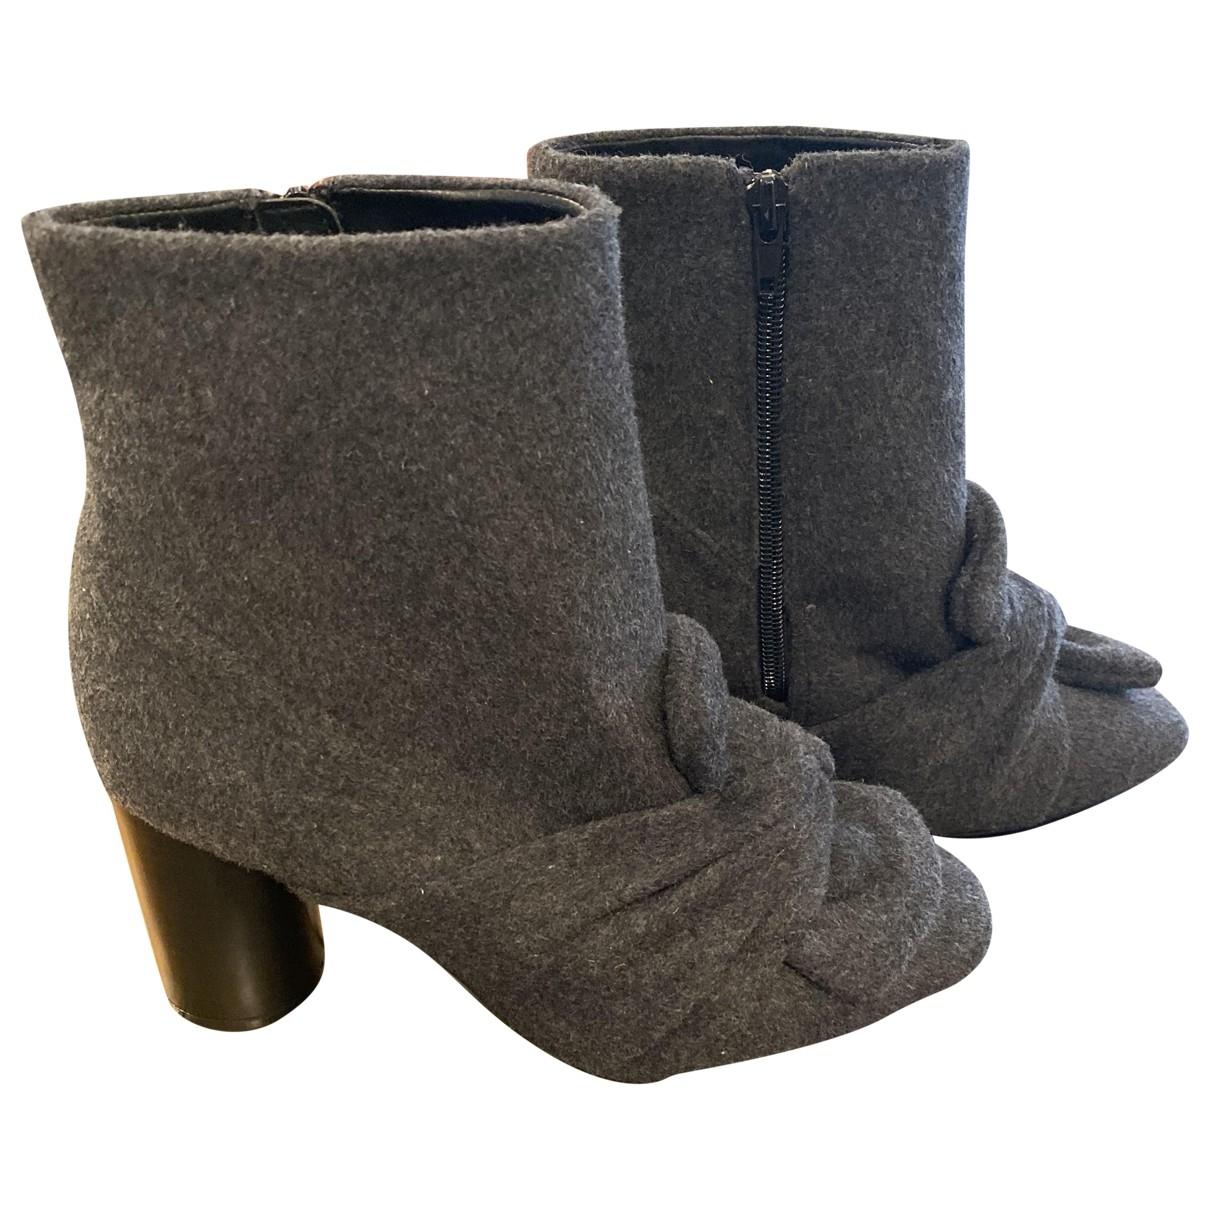 Zara - Boots   pour femme en tweed - gris